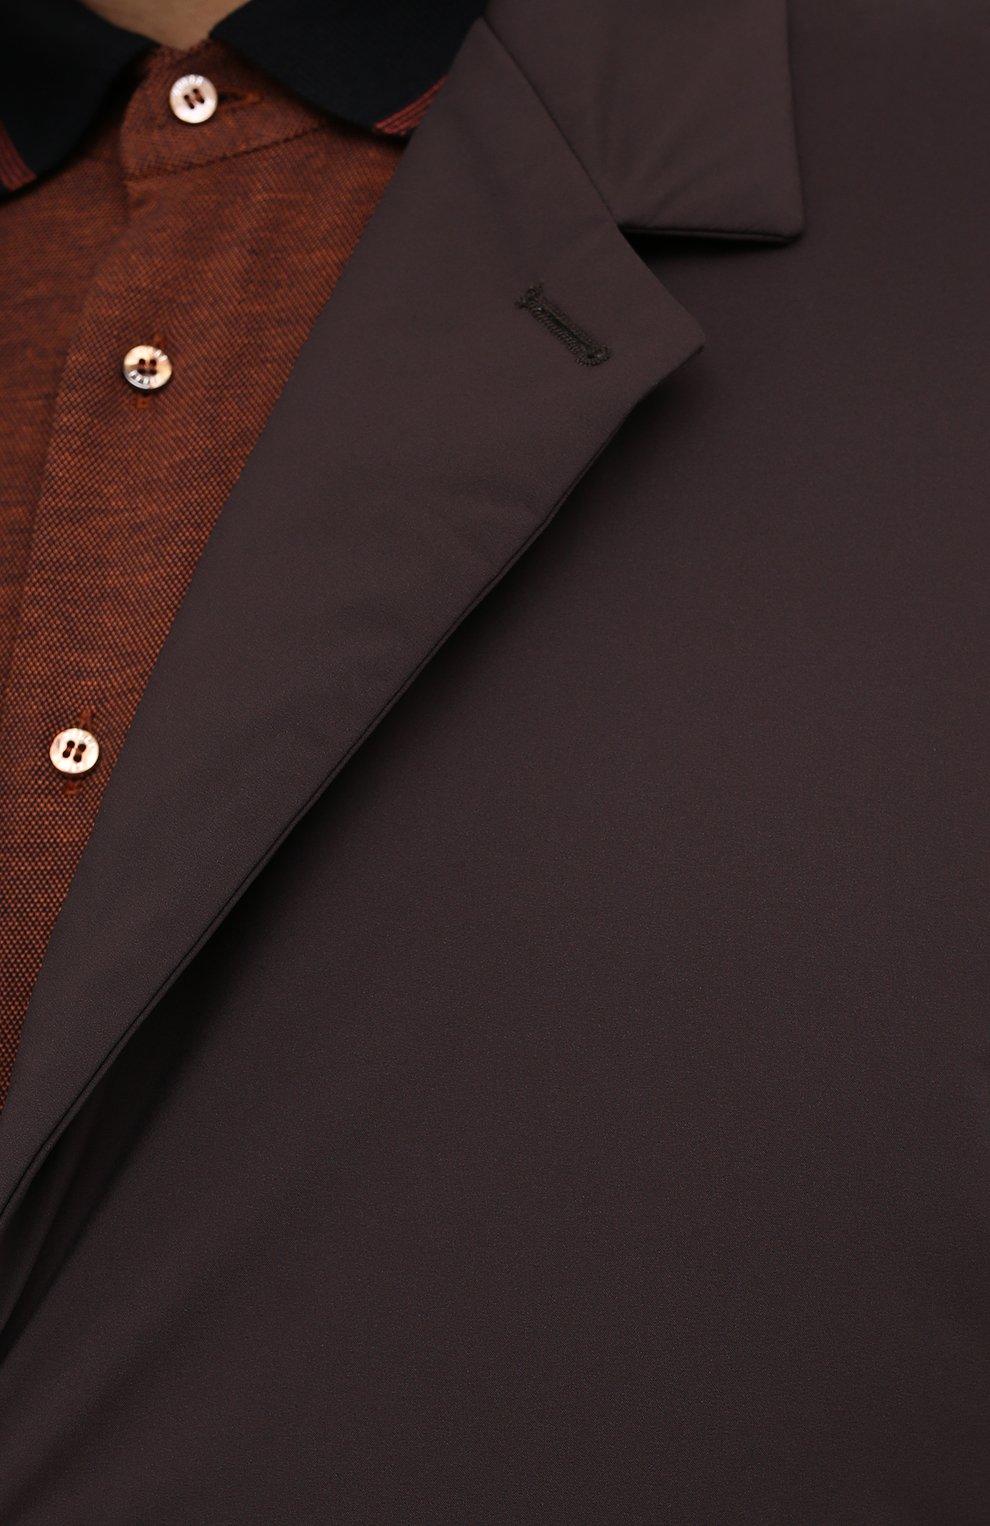 Мужской пуховый плащ KIRED коричневого цвета, арт. WPELM0LW6806527000/62-72 | Фото 5